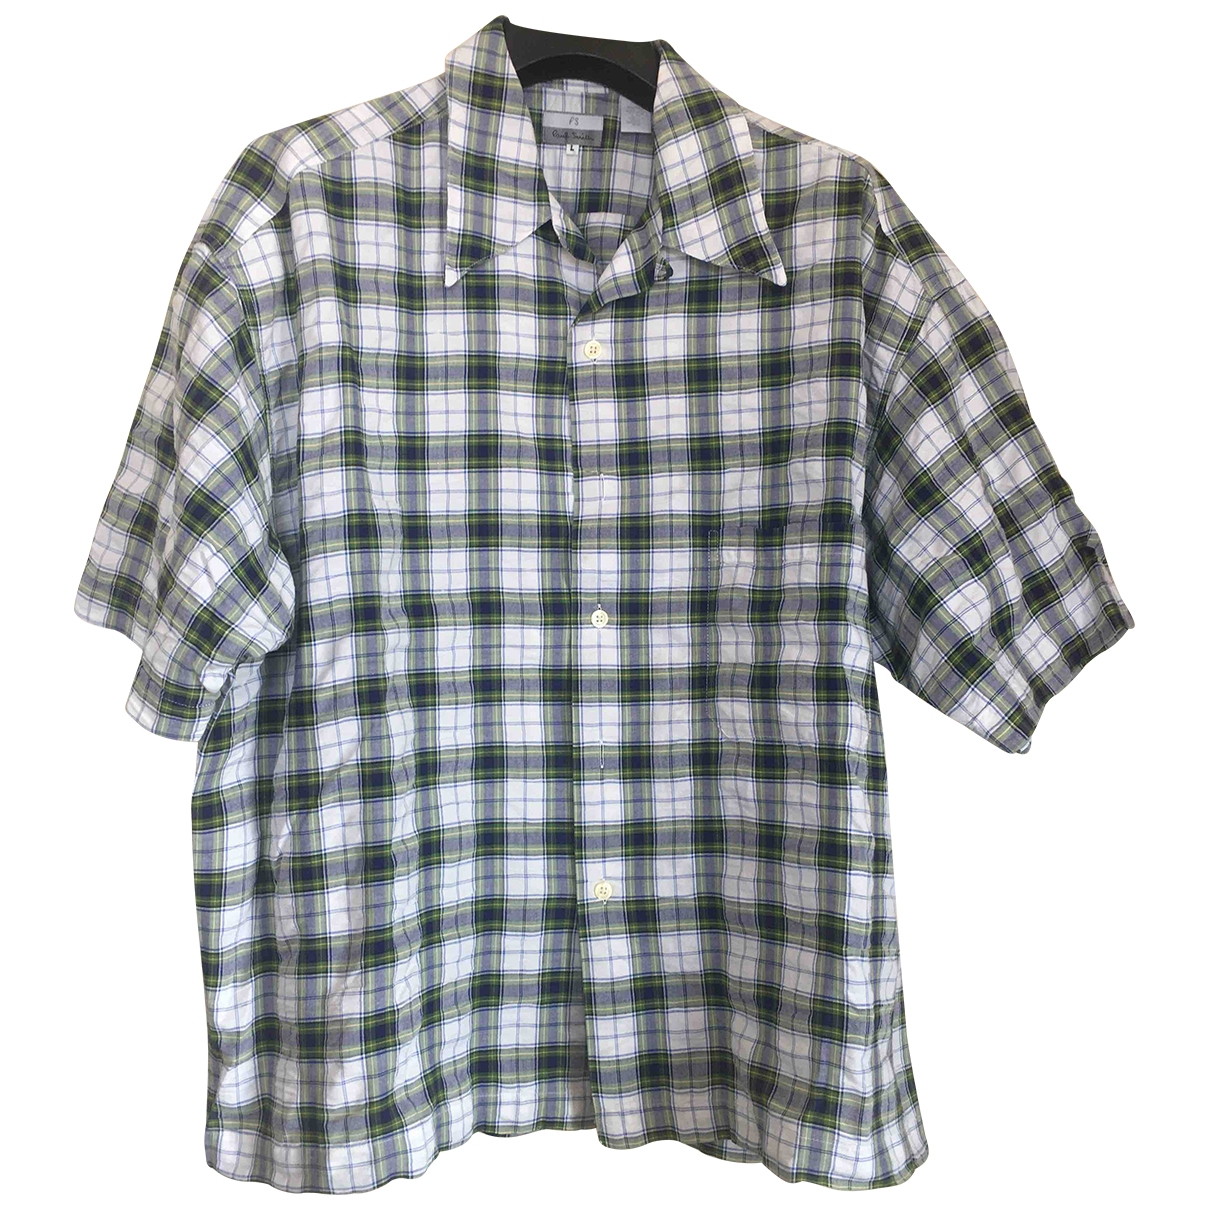 Paul Smith \N Green Cotton Shirts for Men L International